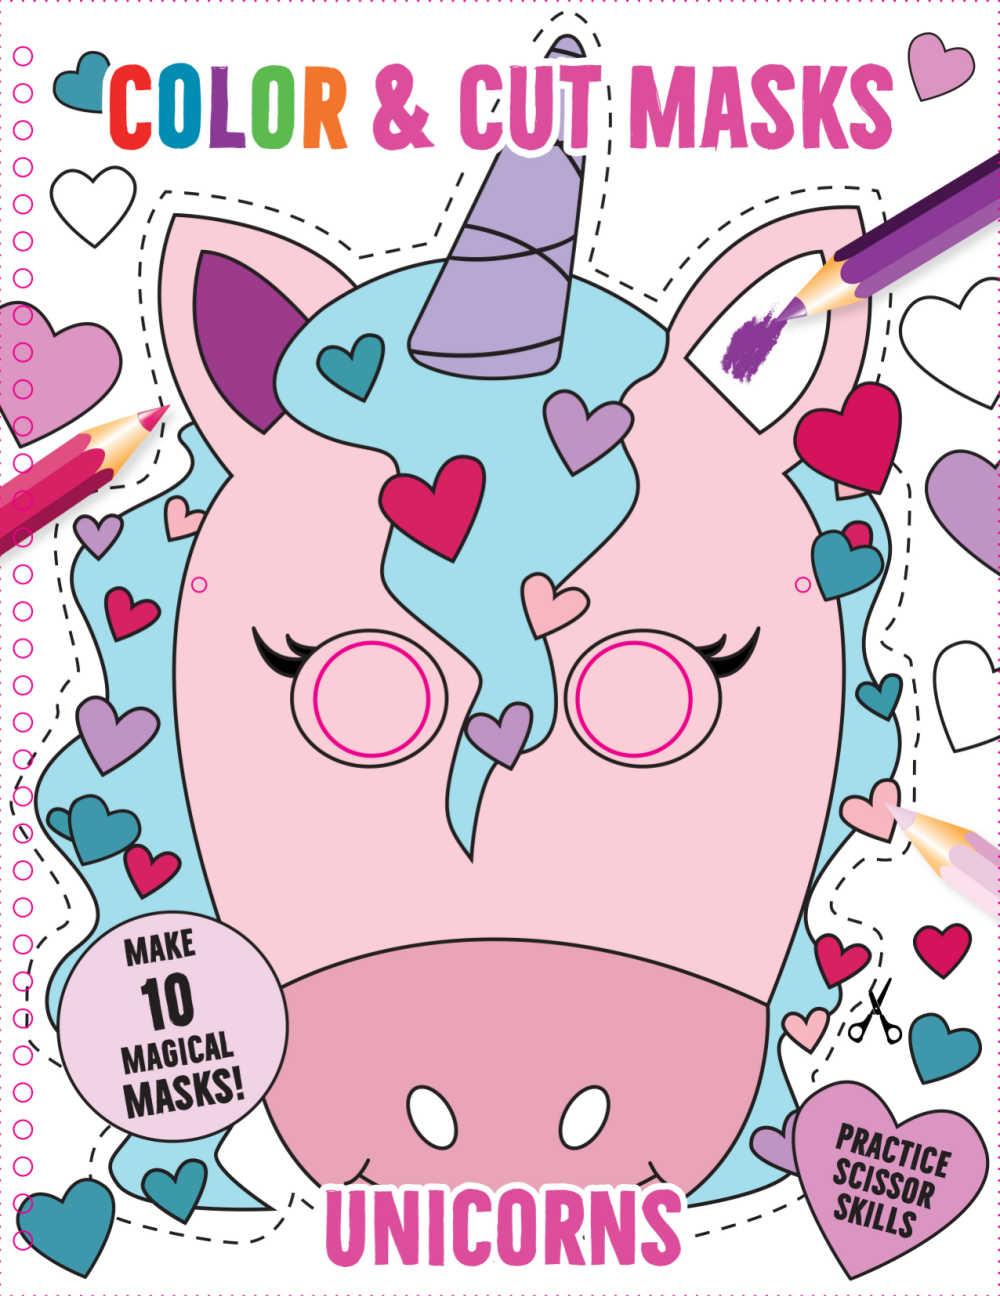 book - cut and color unicorn masks.